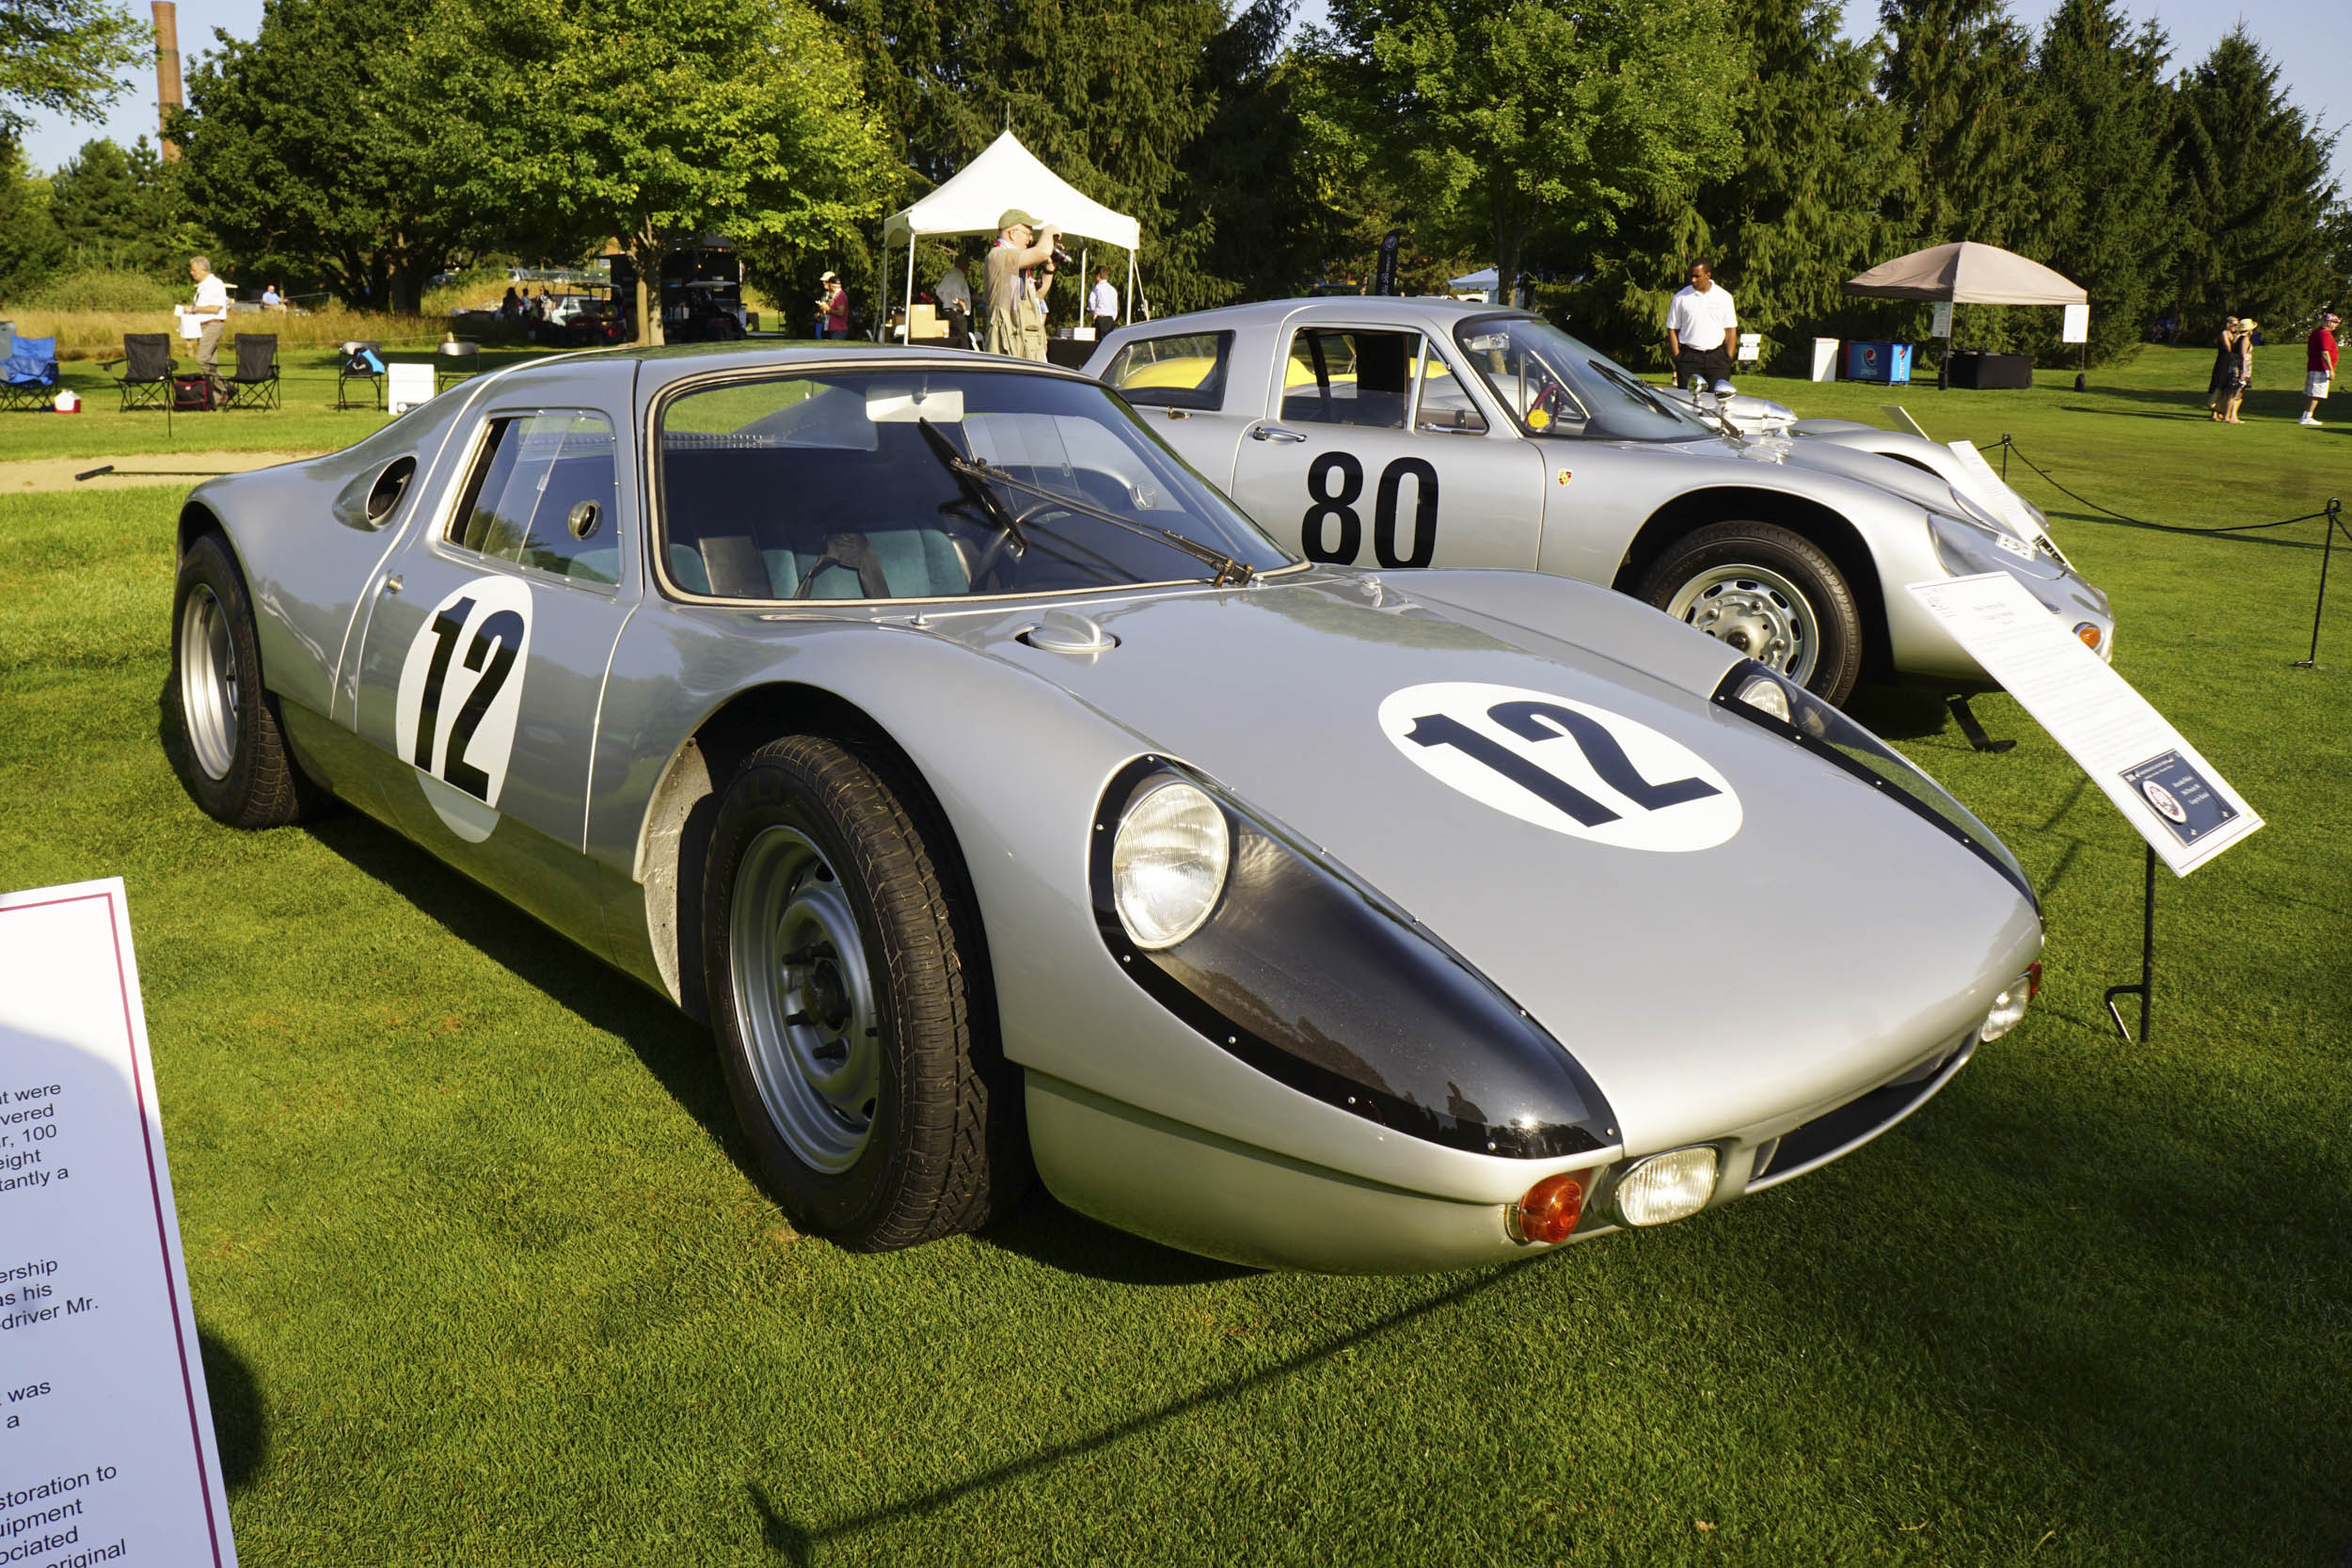 1964 Porsche 904 Carrera GT front 3/4